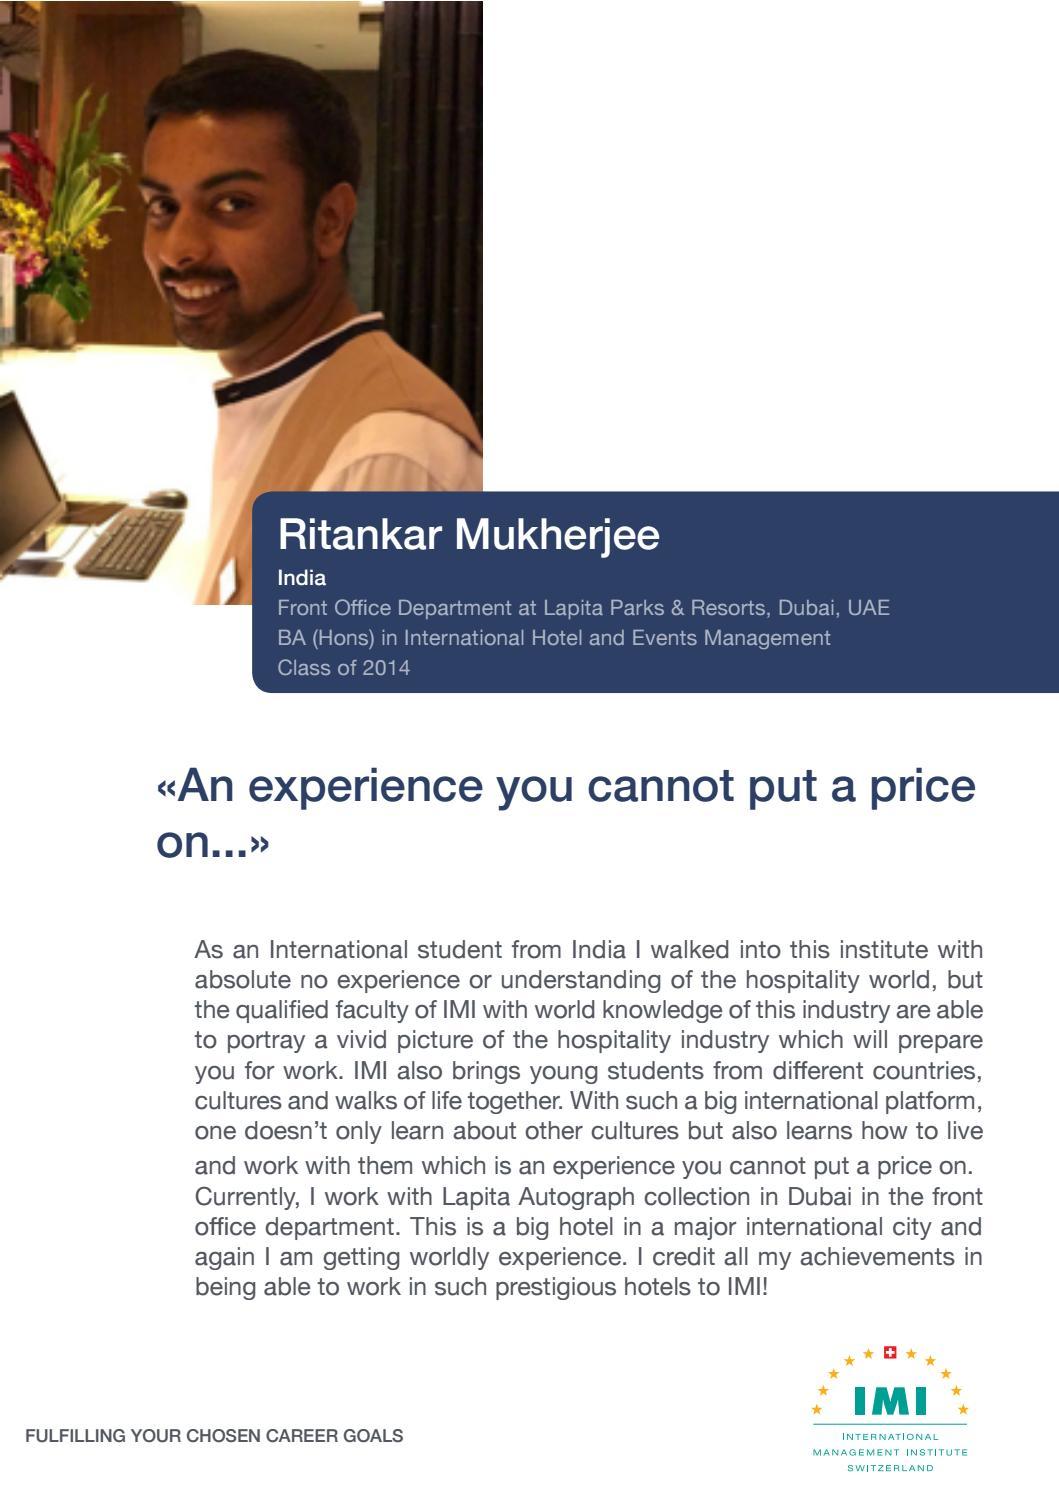 IMI Testimonials - Ritankar Mukherjee - India by IMI Luzern - issuu